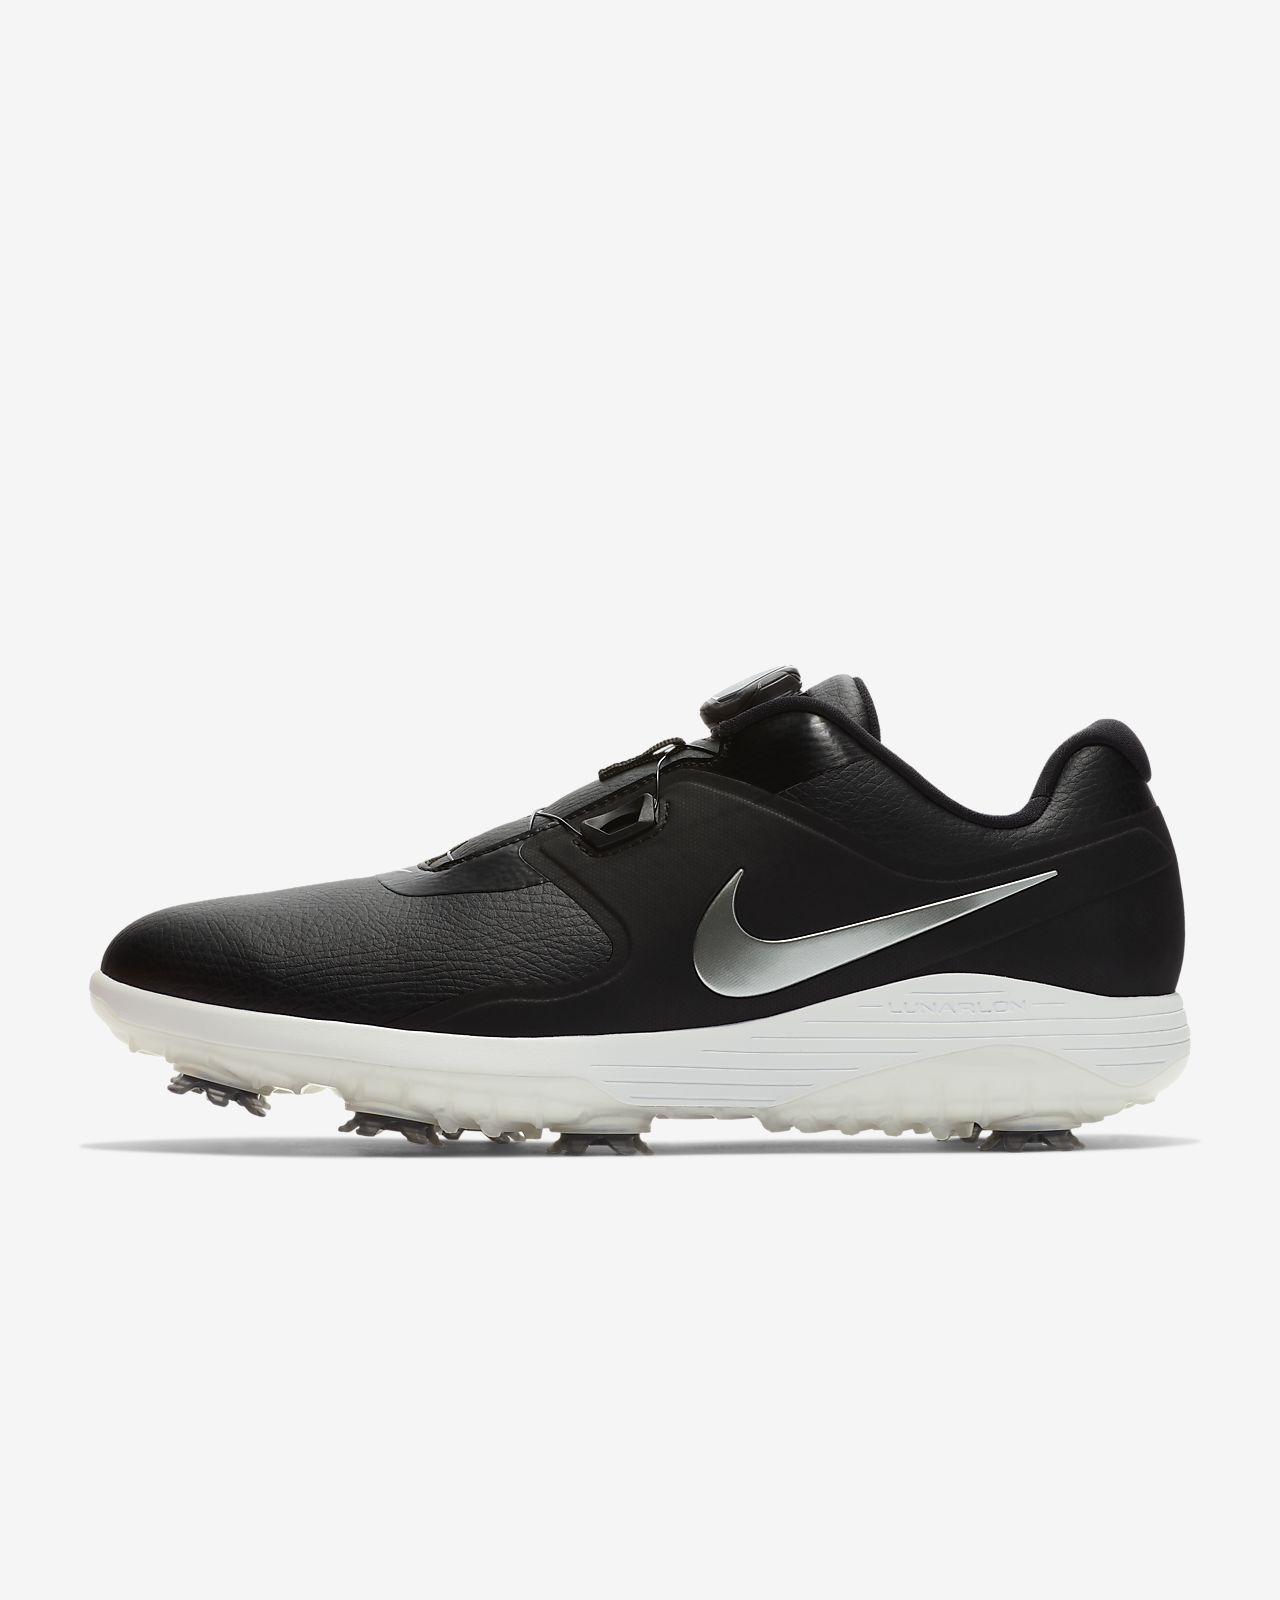 add8432bfdf Nike Vapor Pro Boa Men s Golf Shoe. Nike.com